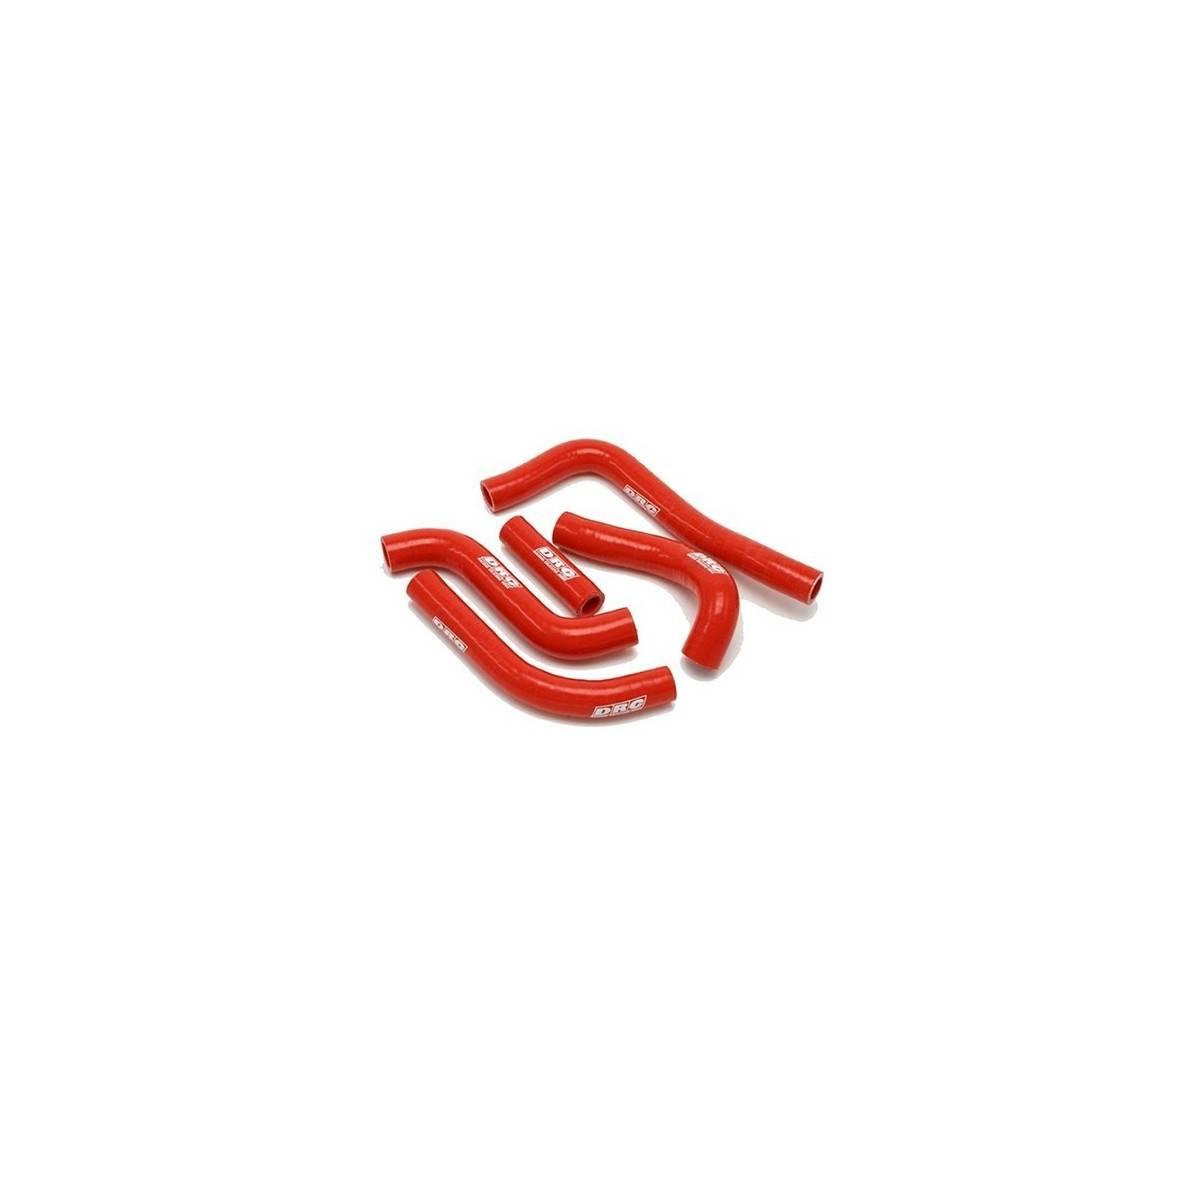 D47.01.083 - Kit Manguitos Radiador Honda Crf450R ´09-12 Rojo